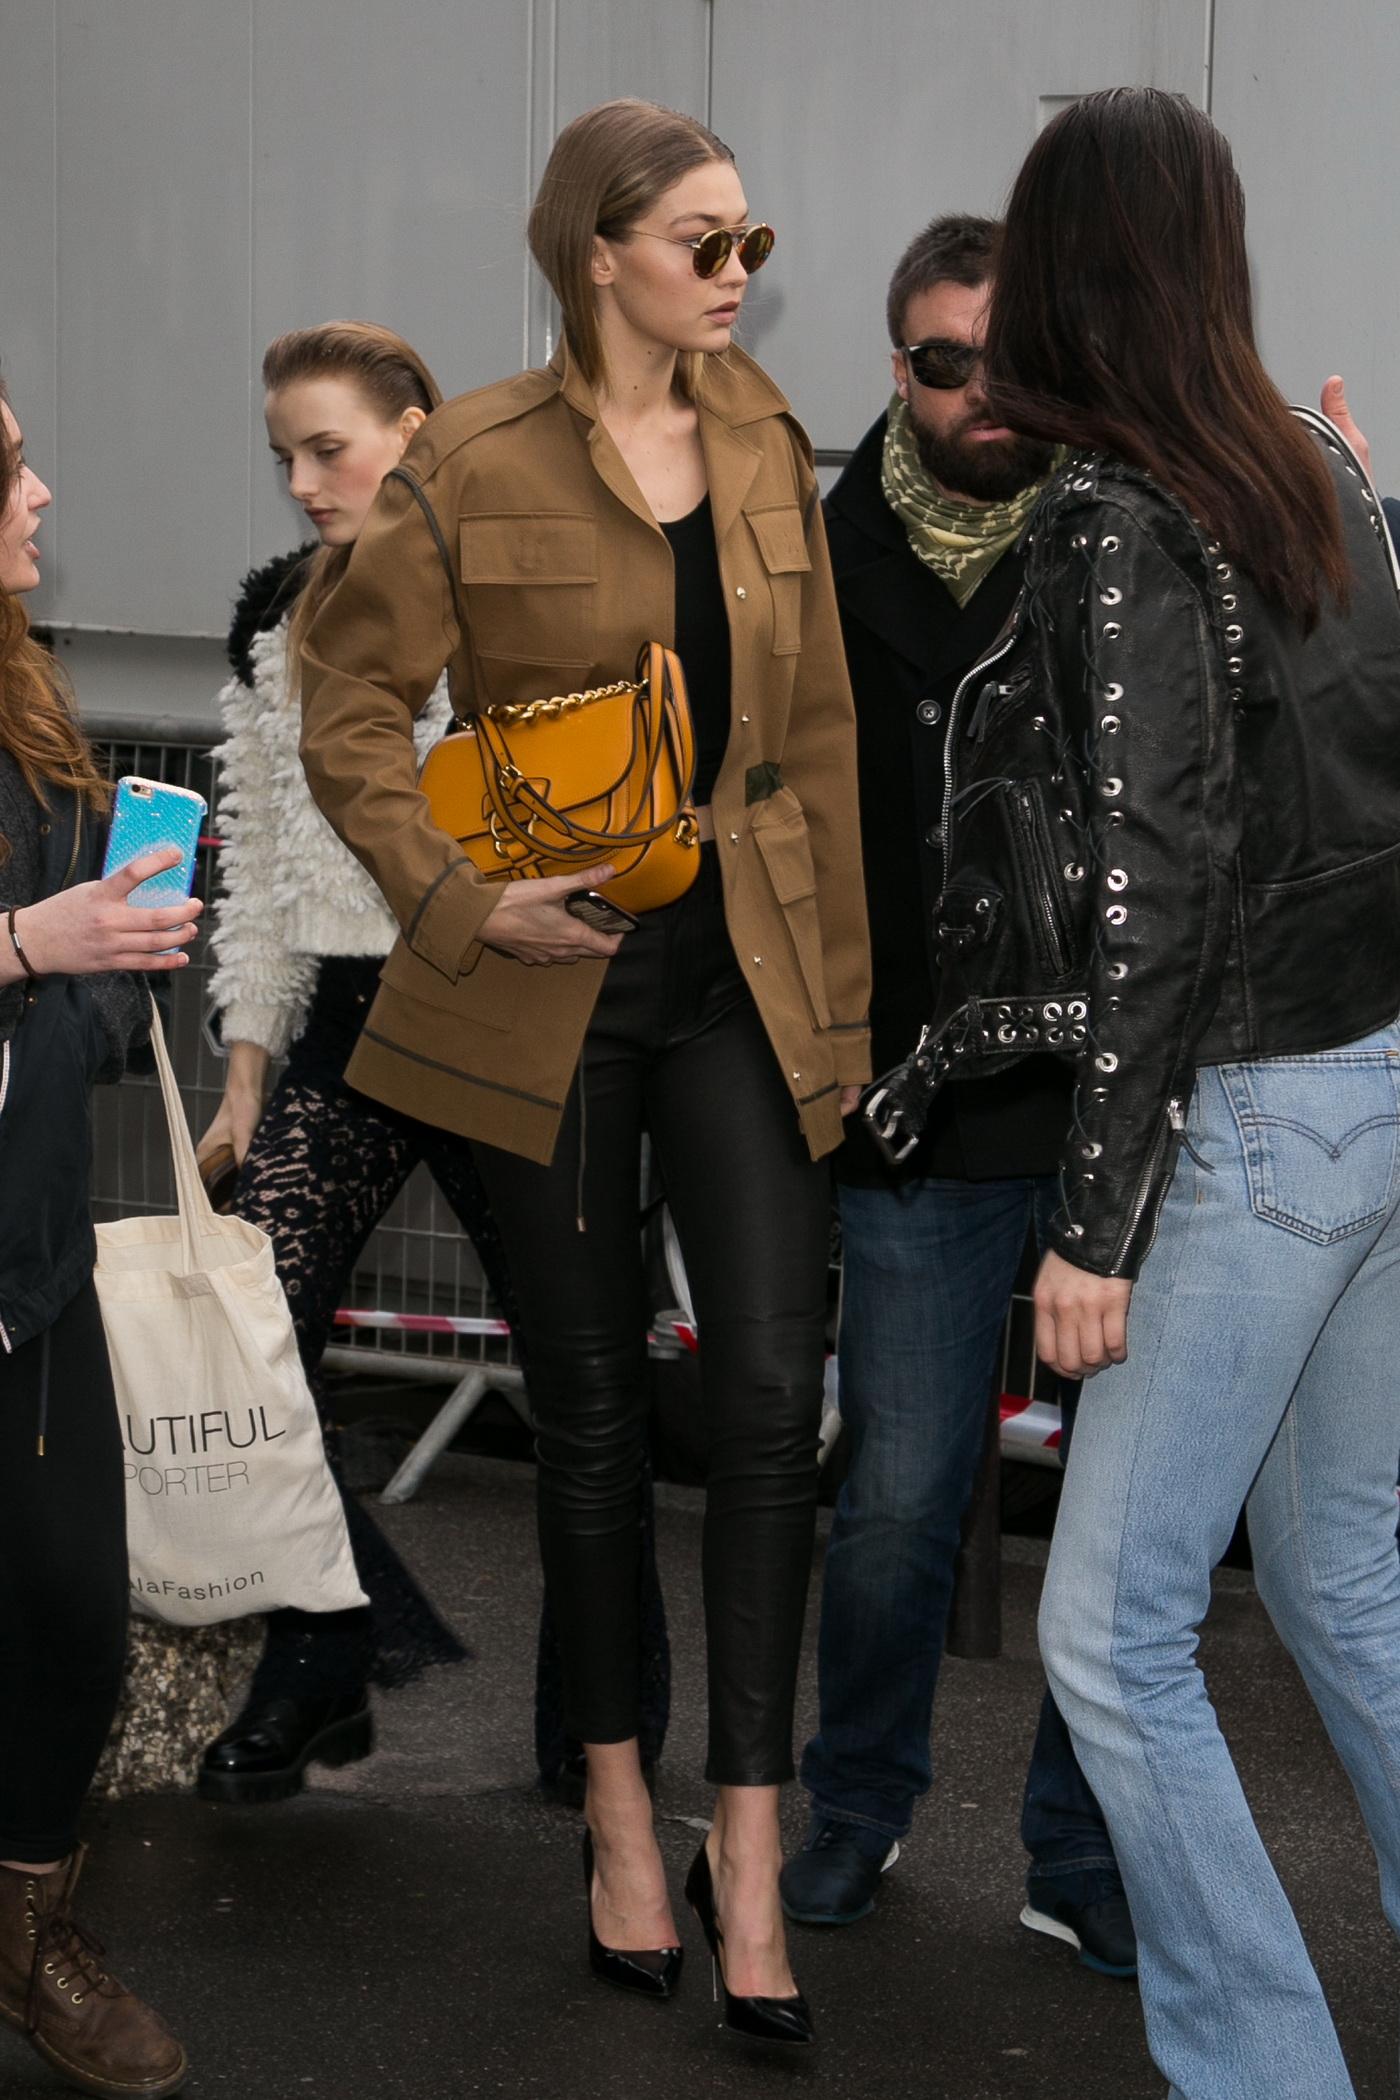 3384bc7e14 These STARS are wearing the Miu Miu DAHLIA Bag!